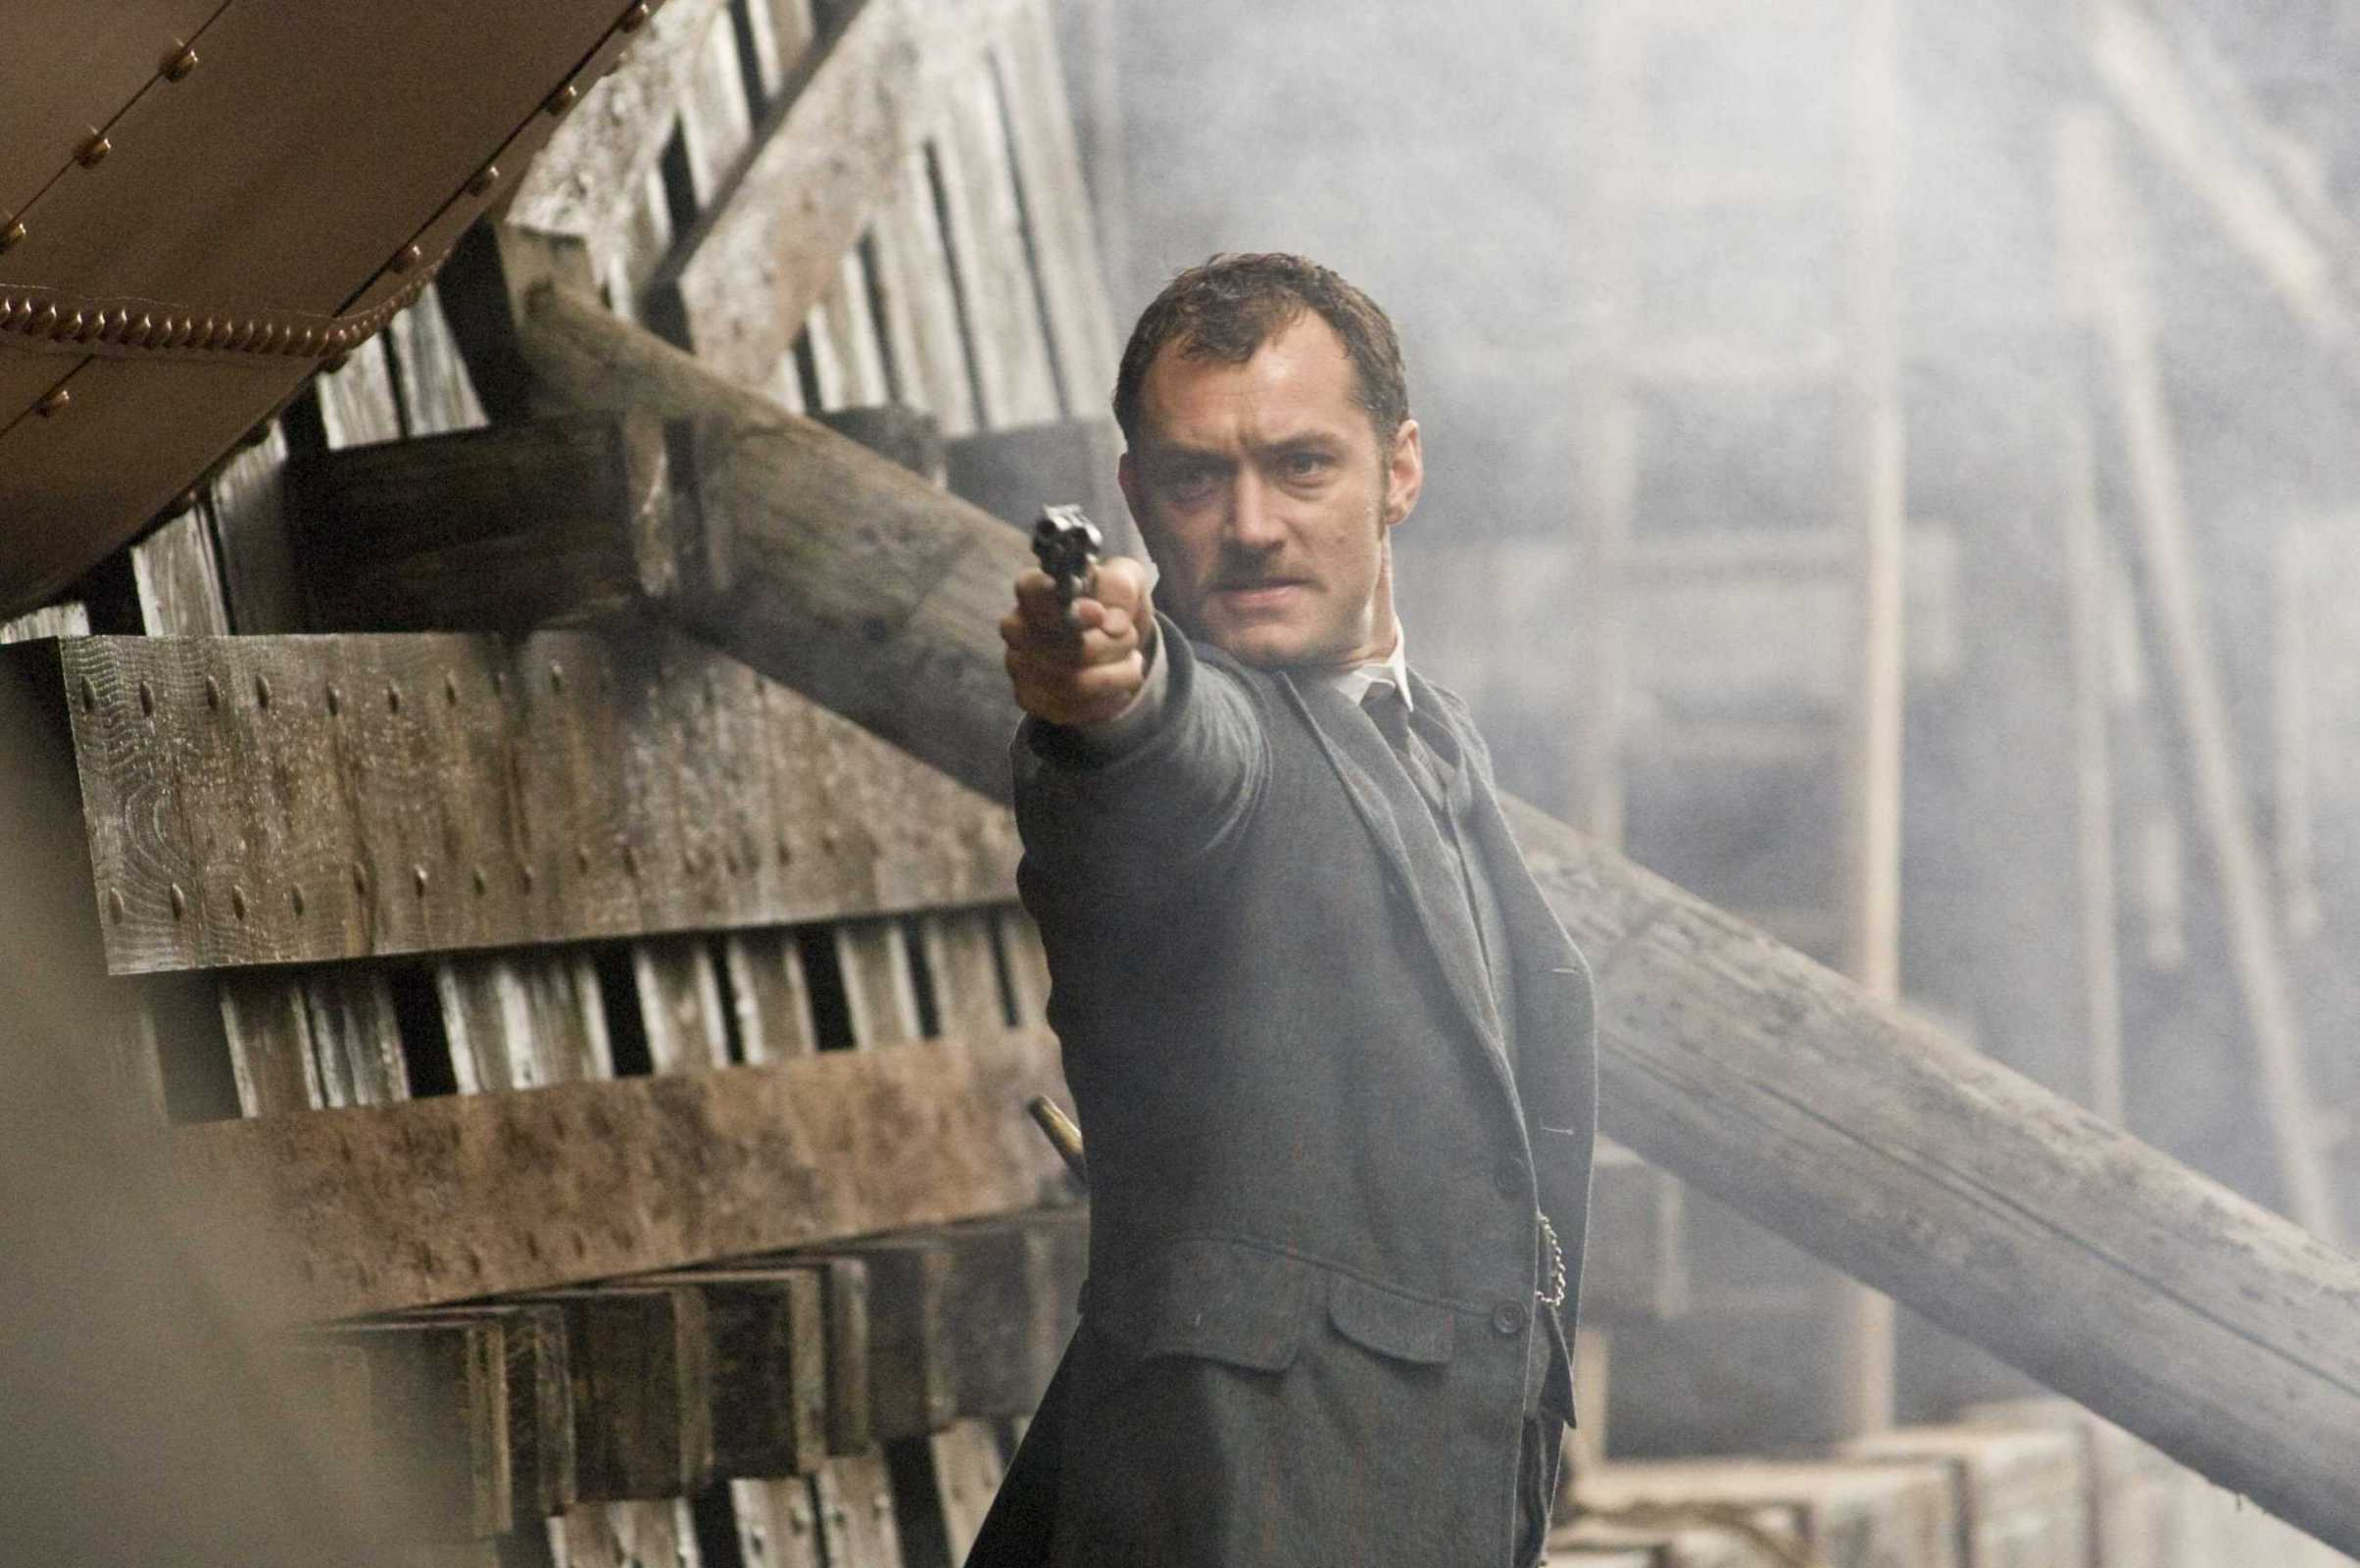 кадры из фильма Шерлок Холмс Джуд Лоу,